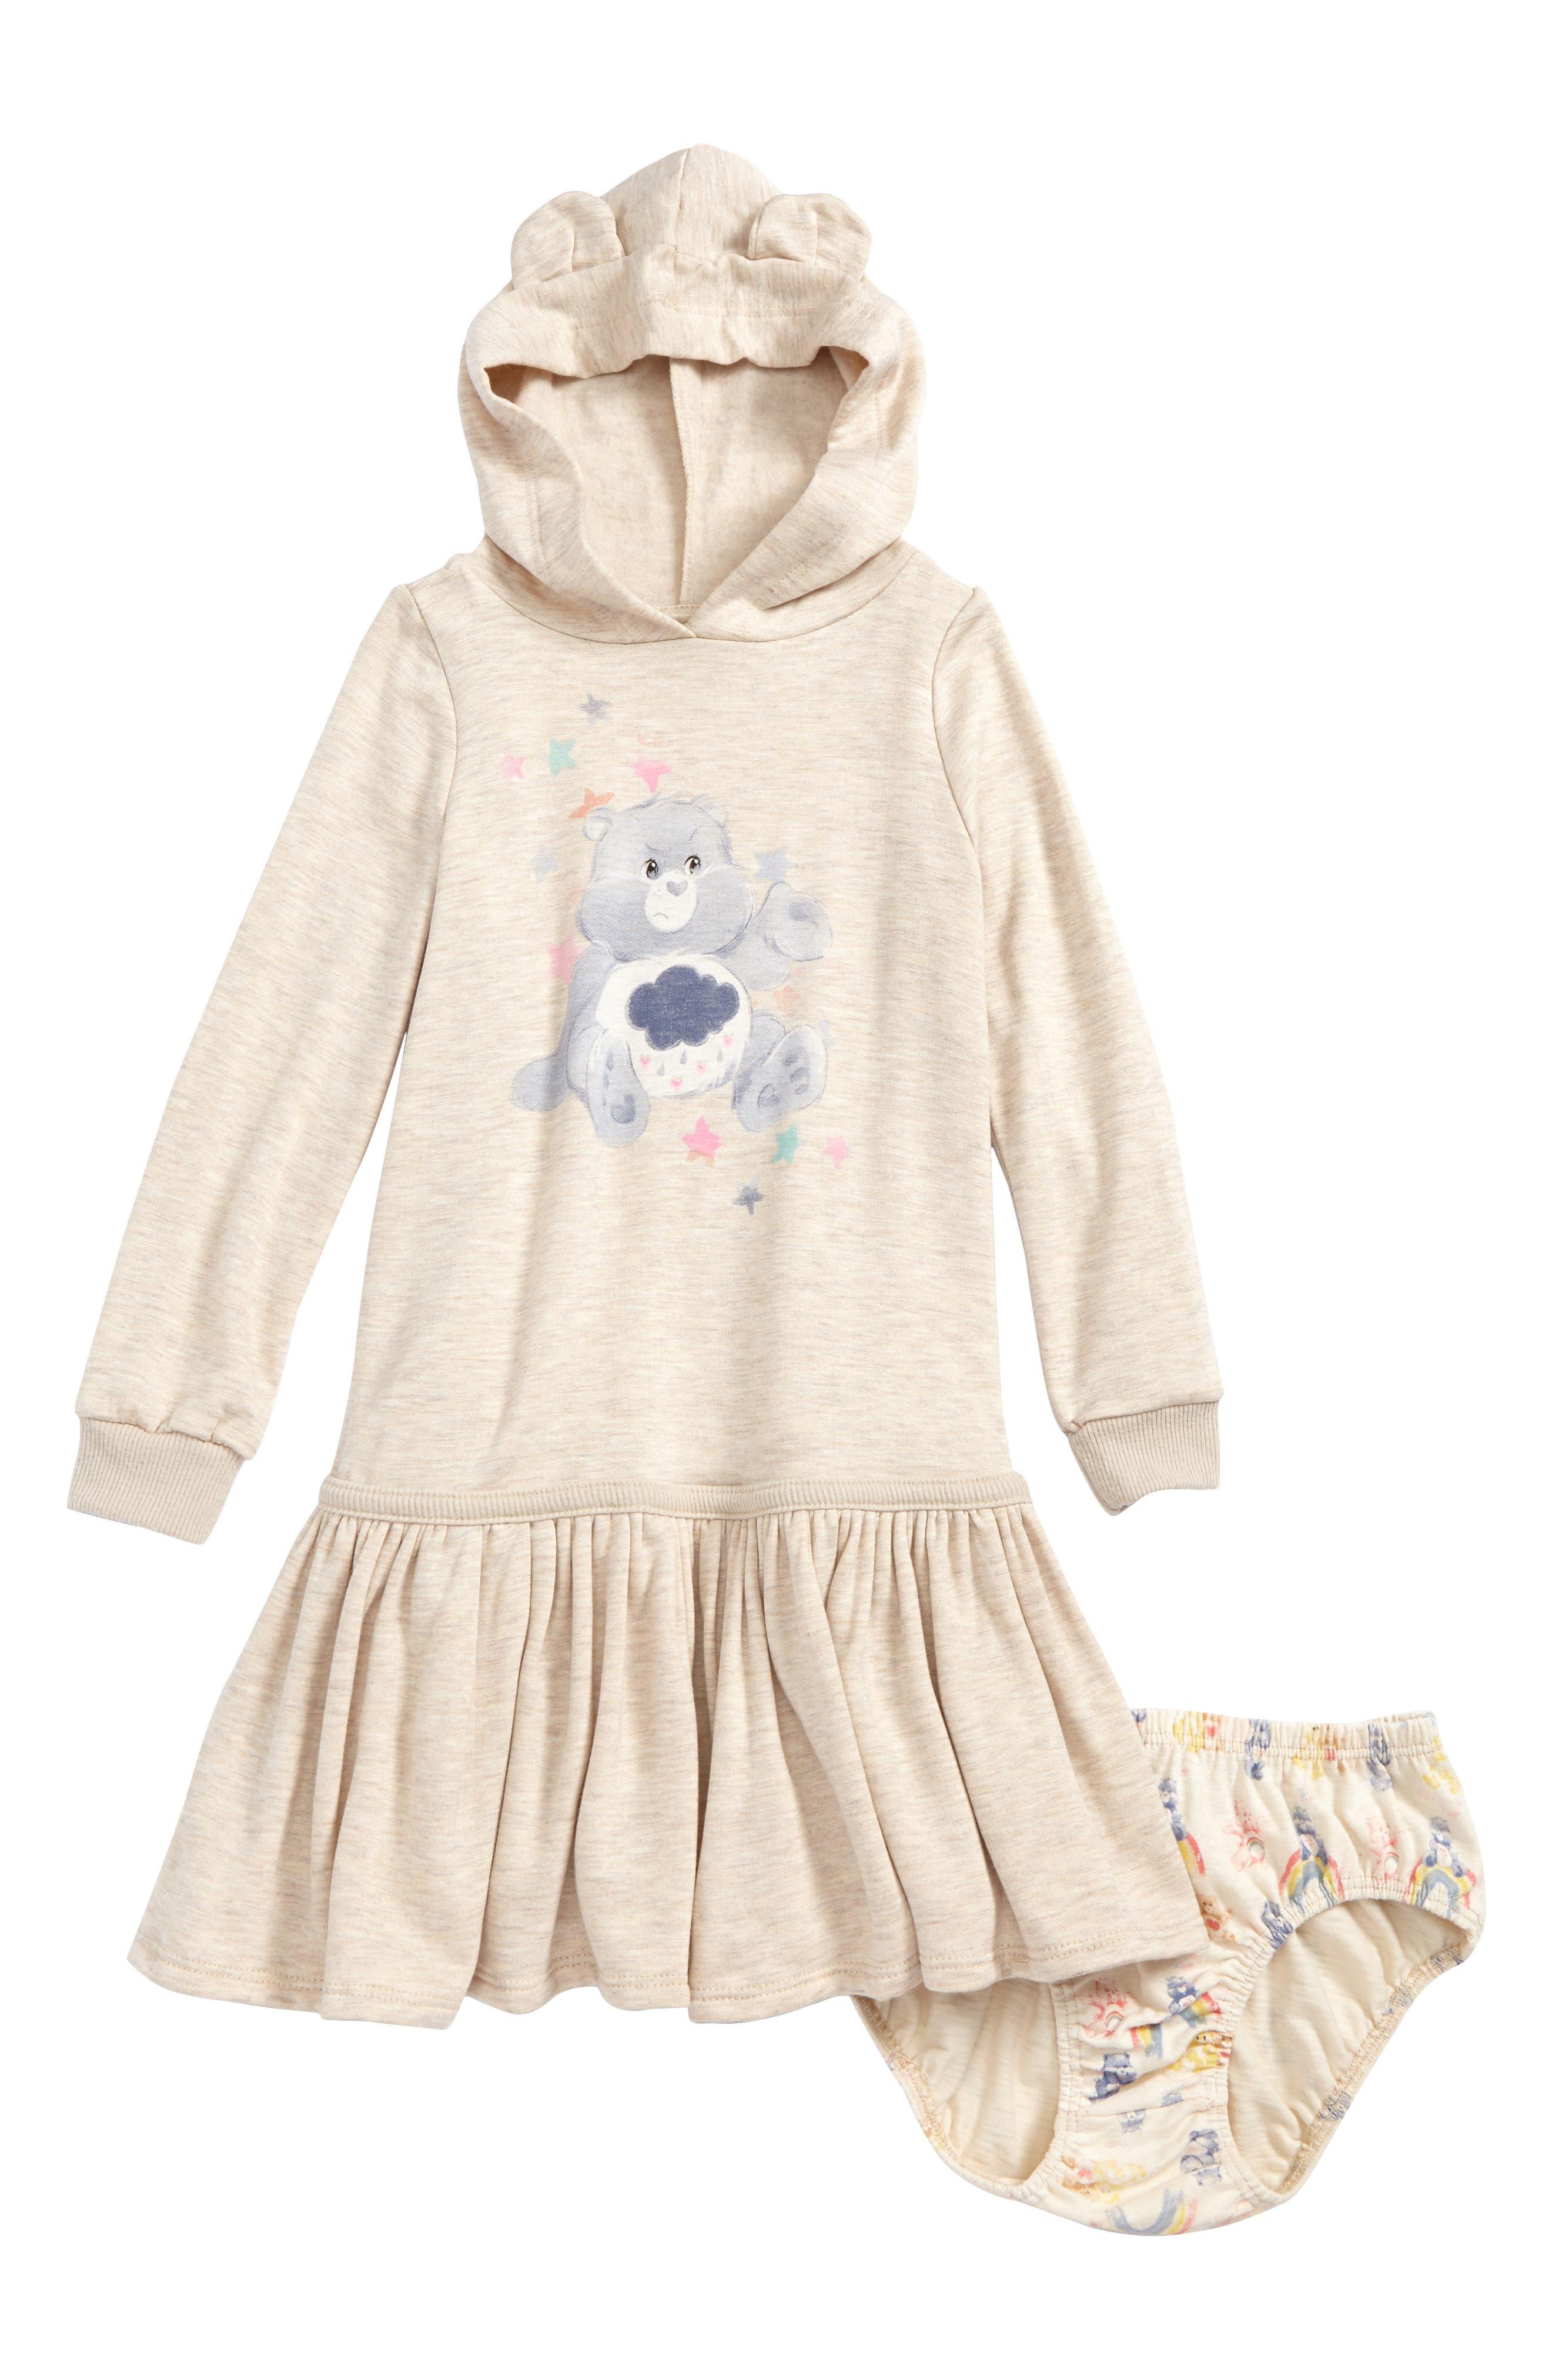 Main Image - Care Bears™ by Fine Threads Hooded Dress (Toddler Girls & Little Girls)